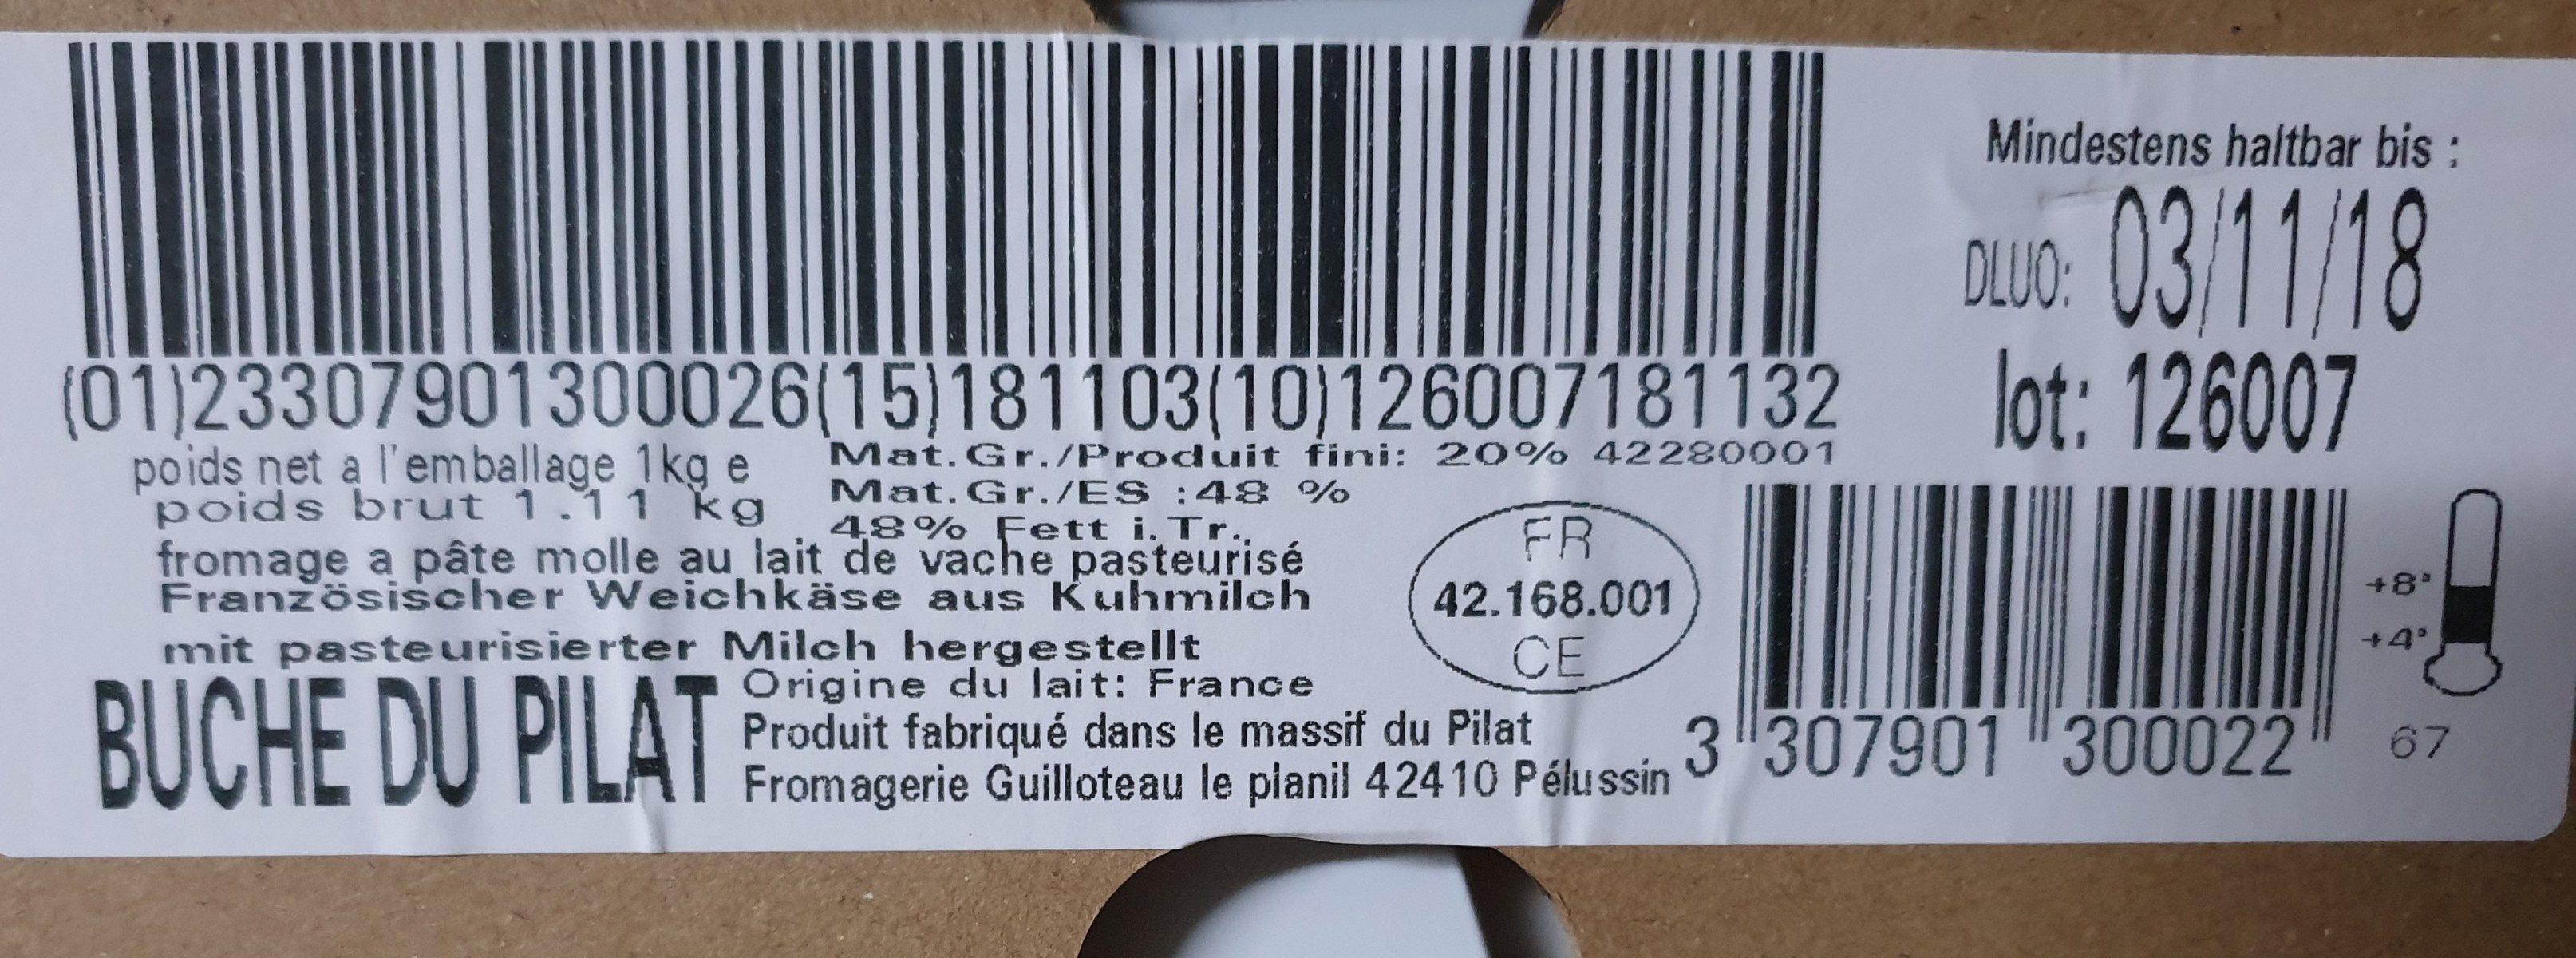 Bûche Du Pilat 20 % - Ingrediënten - fr